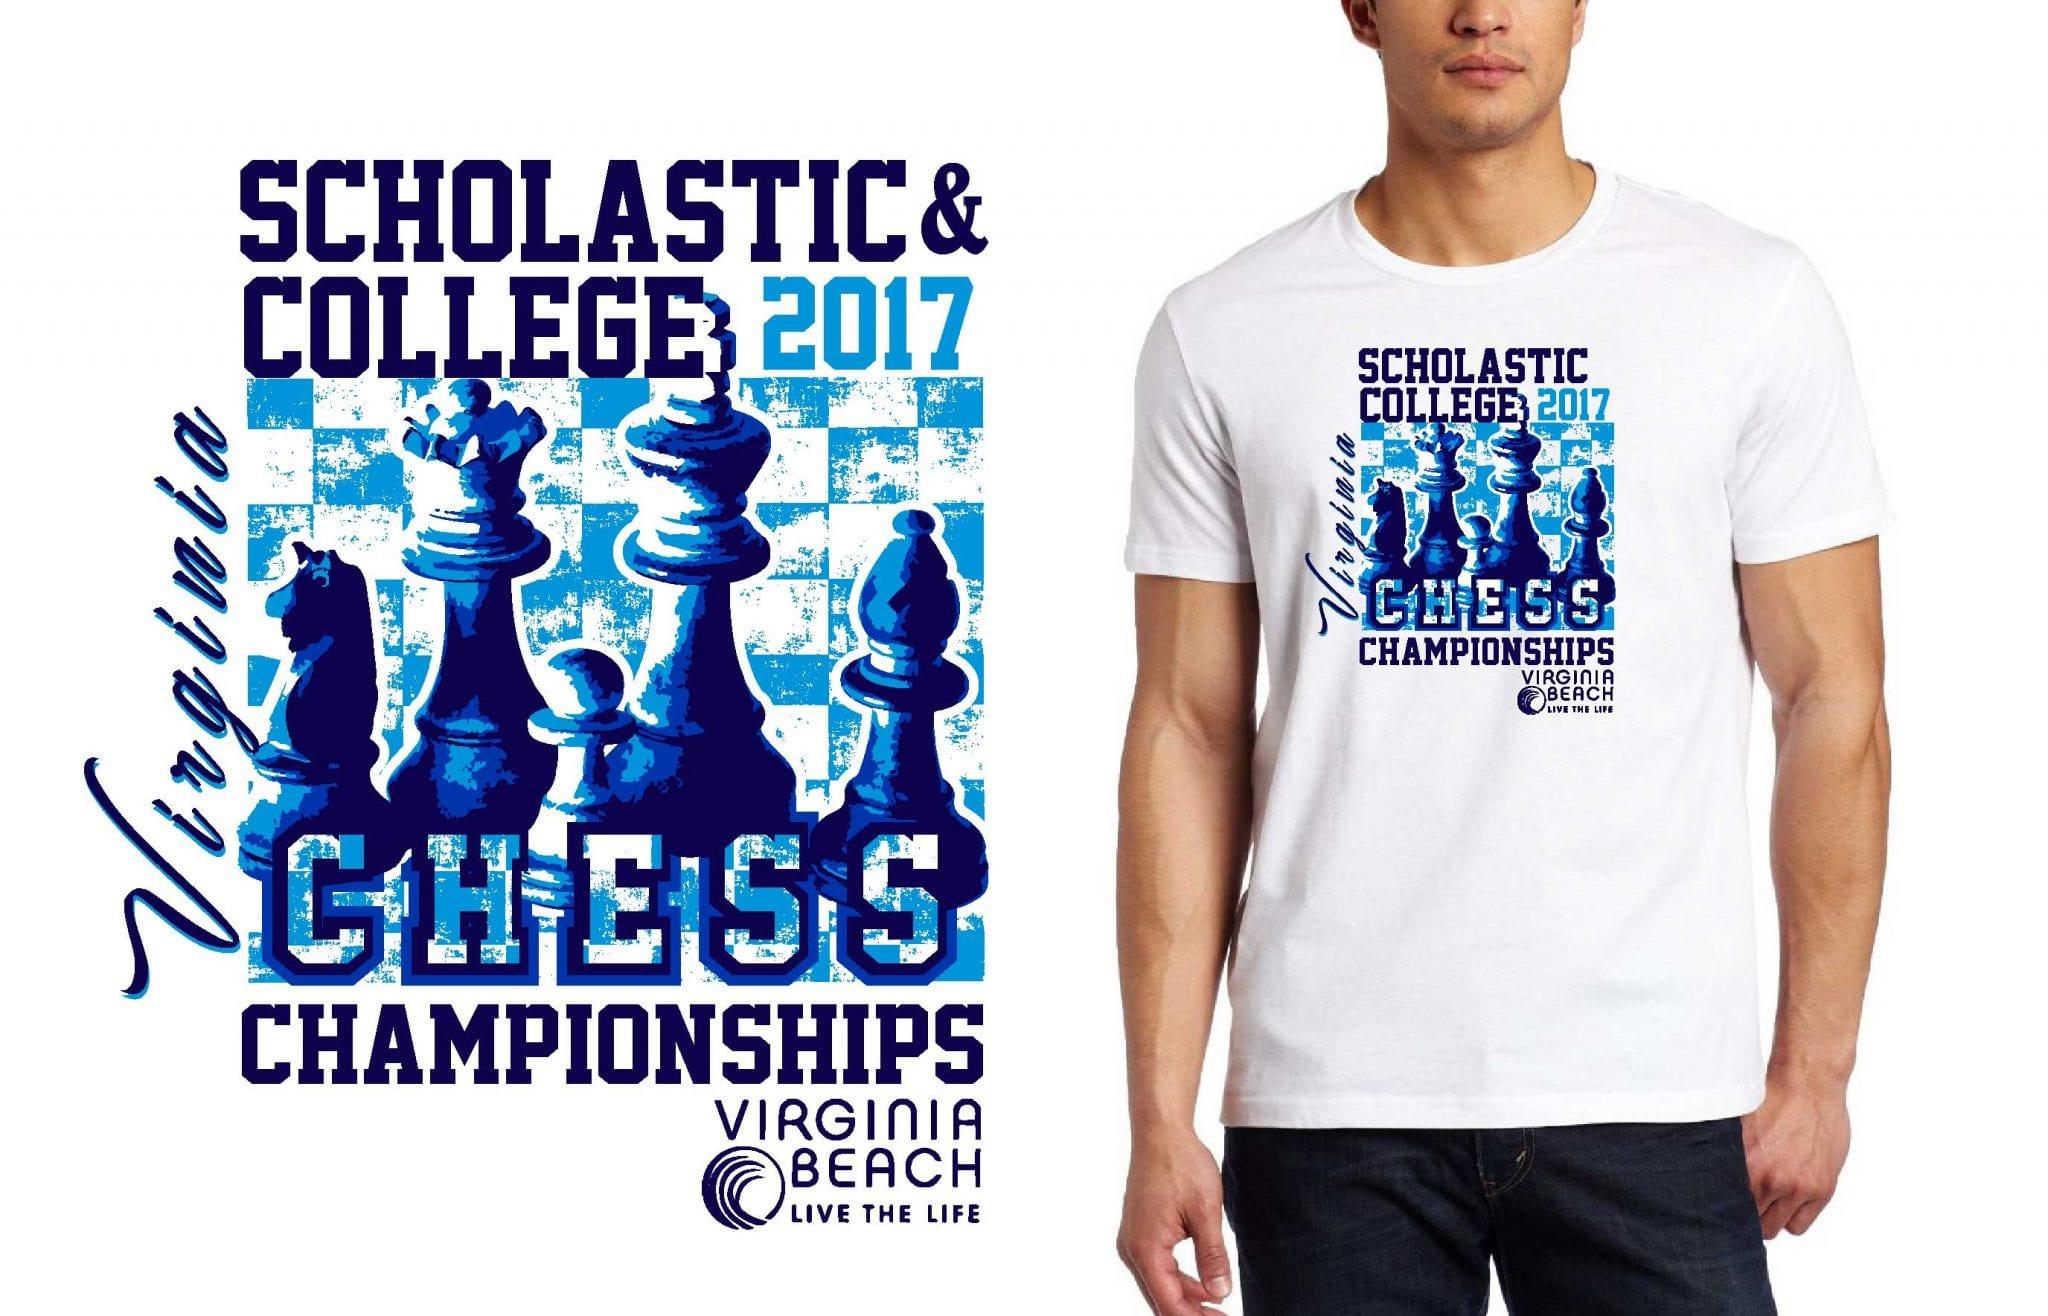 2017 VA Scholastic College Chess vector logo design for t-shirt UrArtStudio